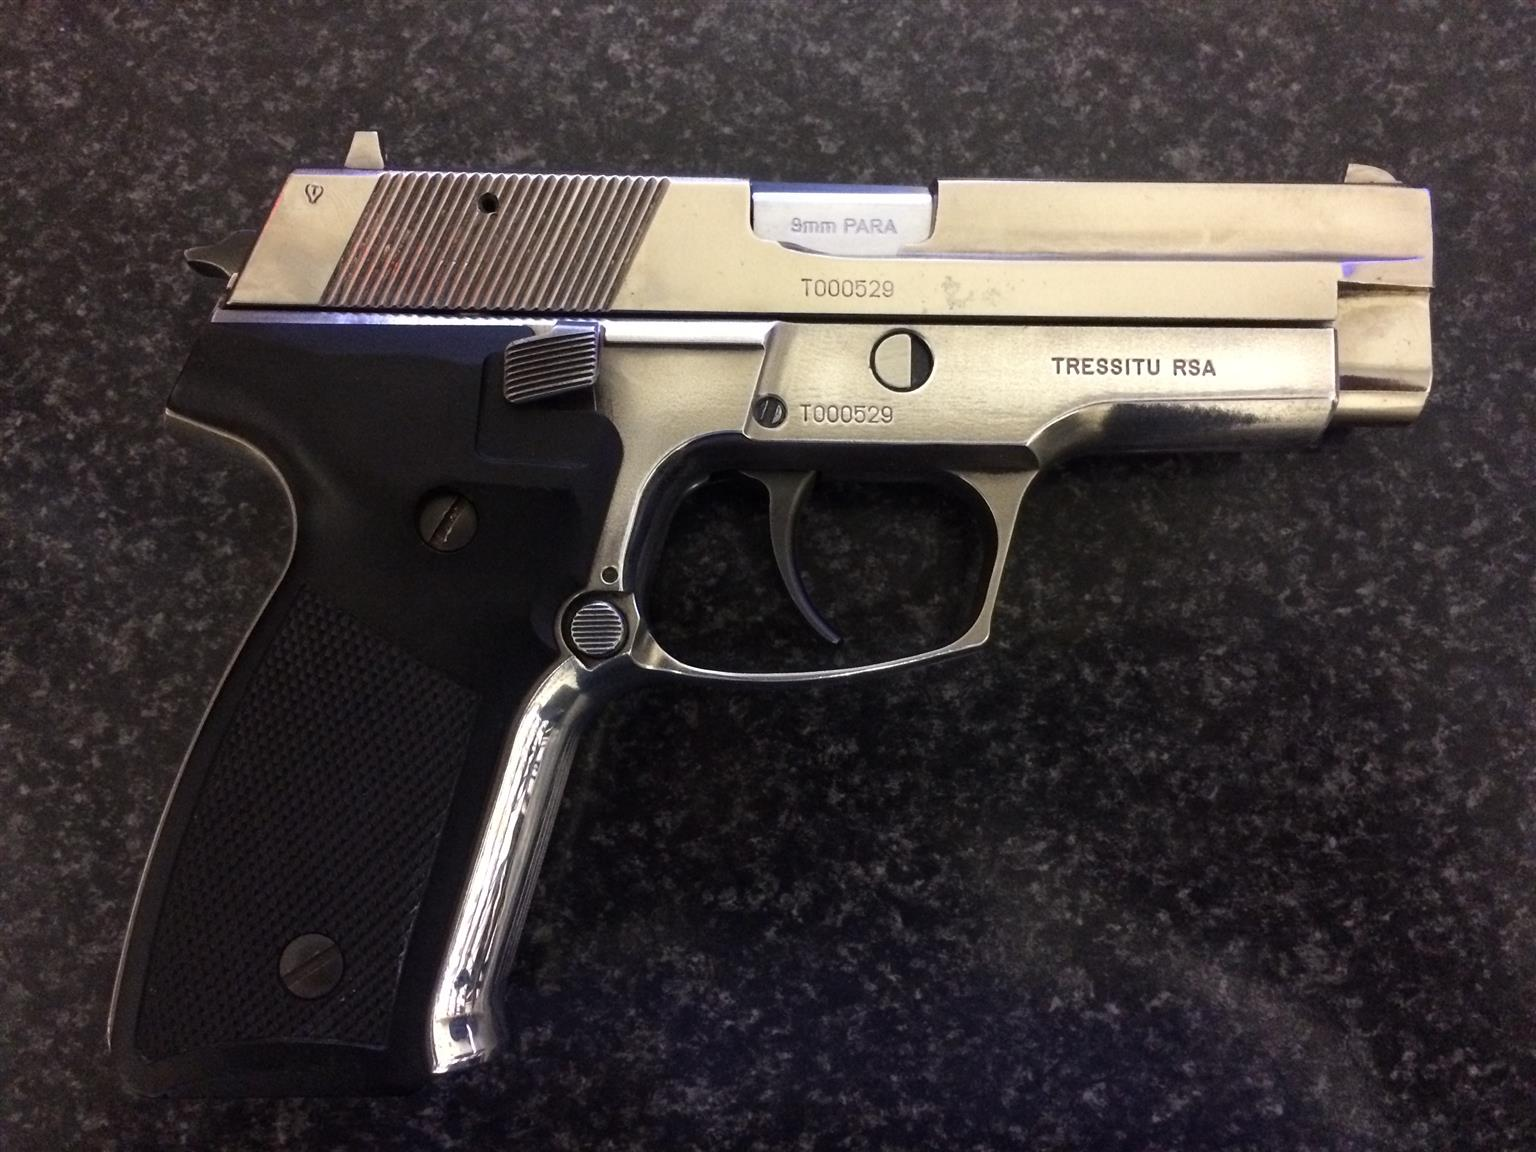 TZ 99 9mm pistol